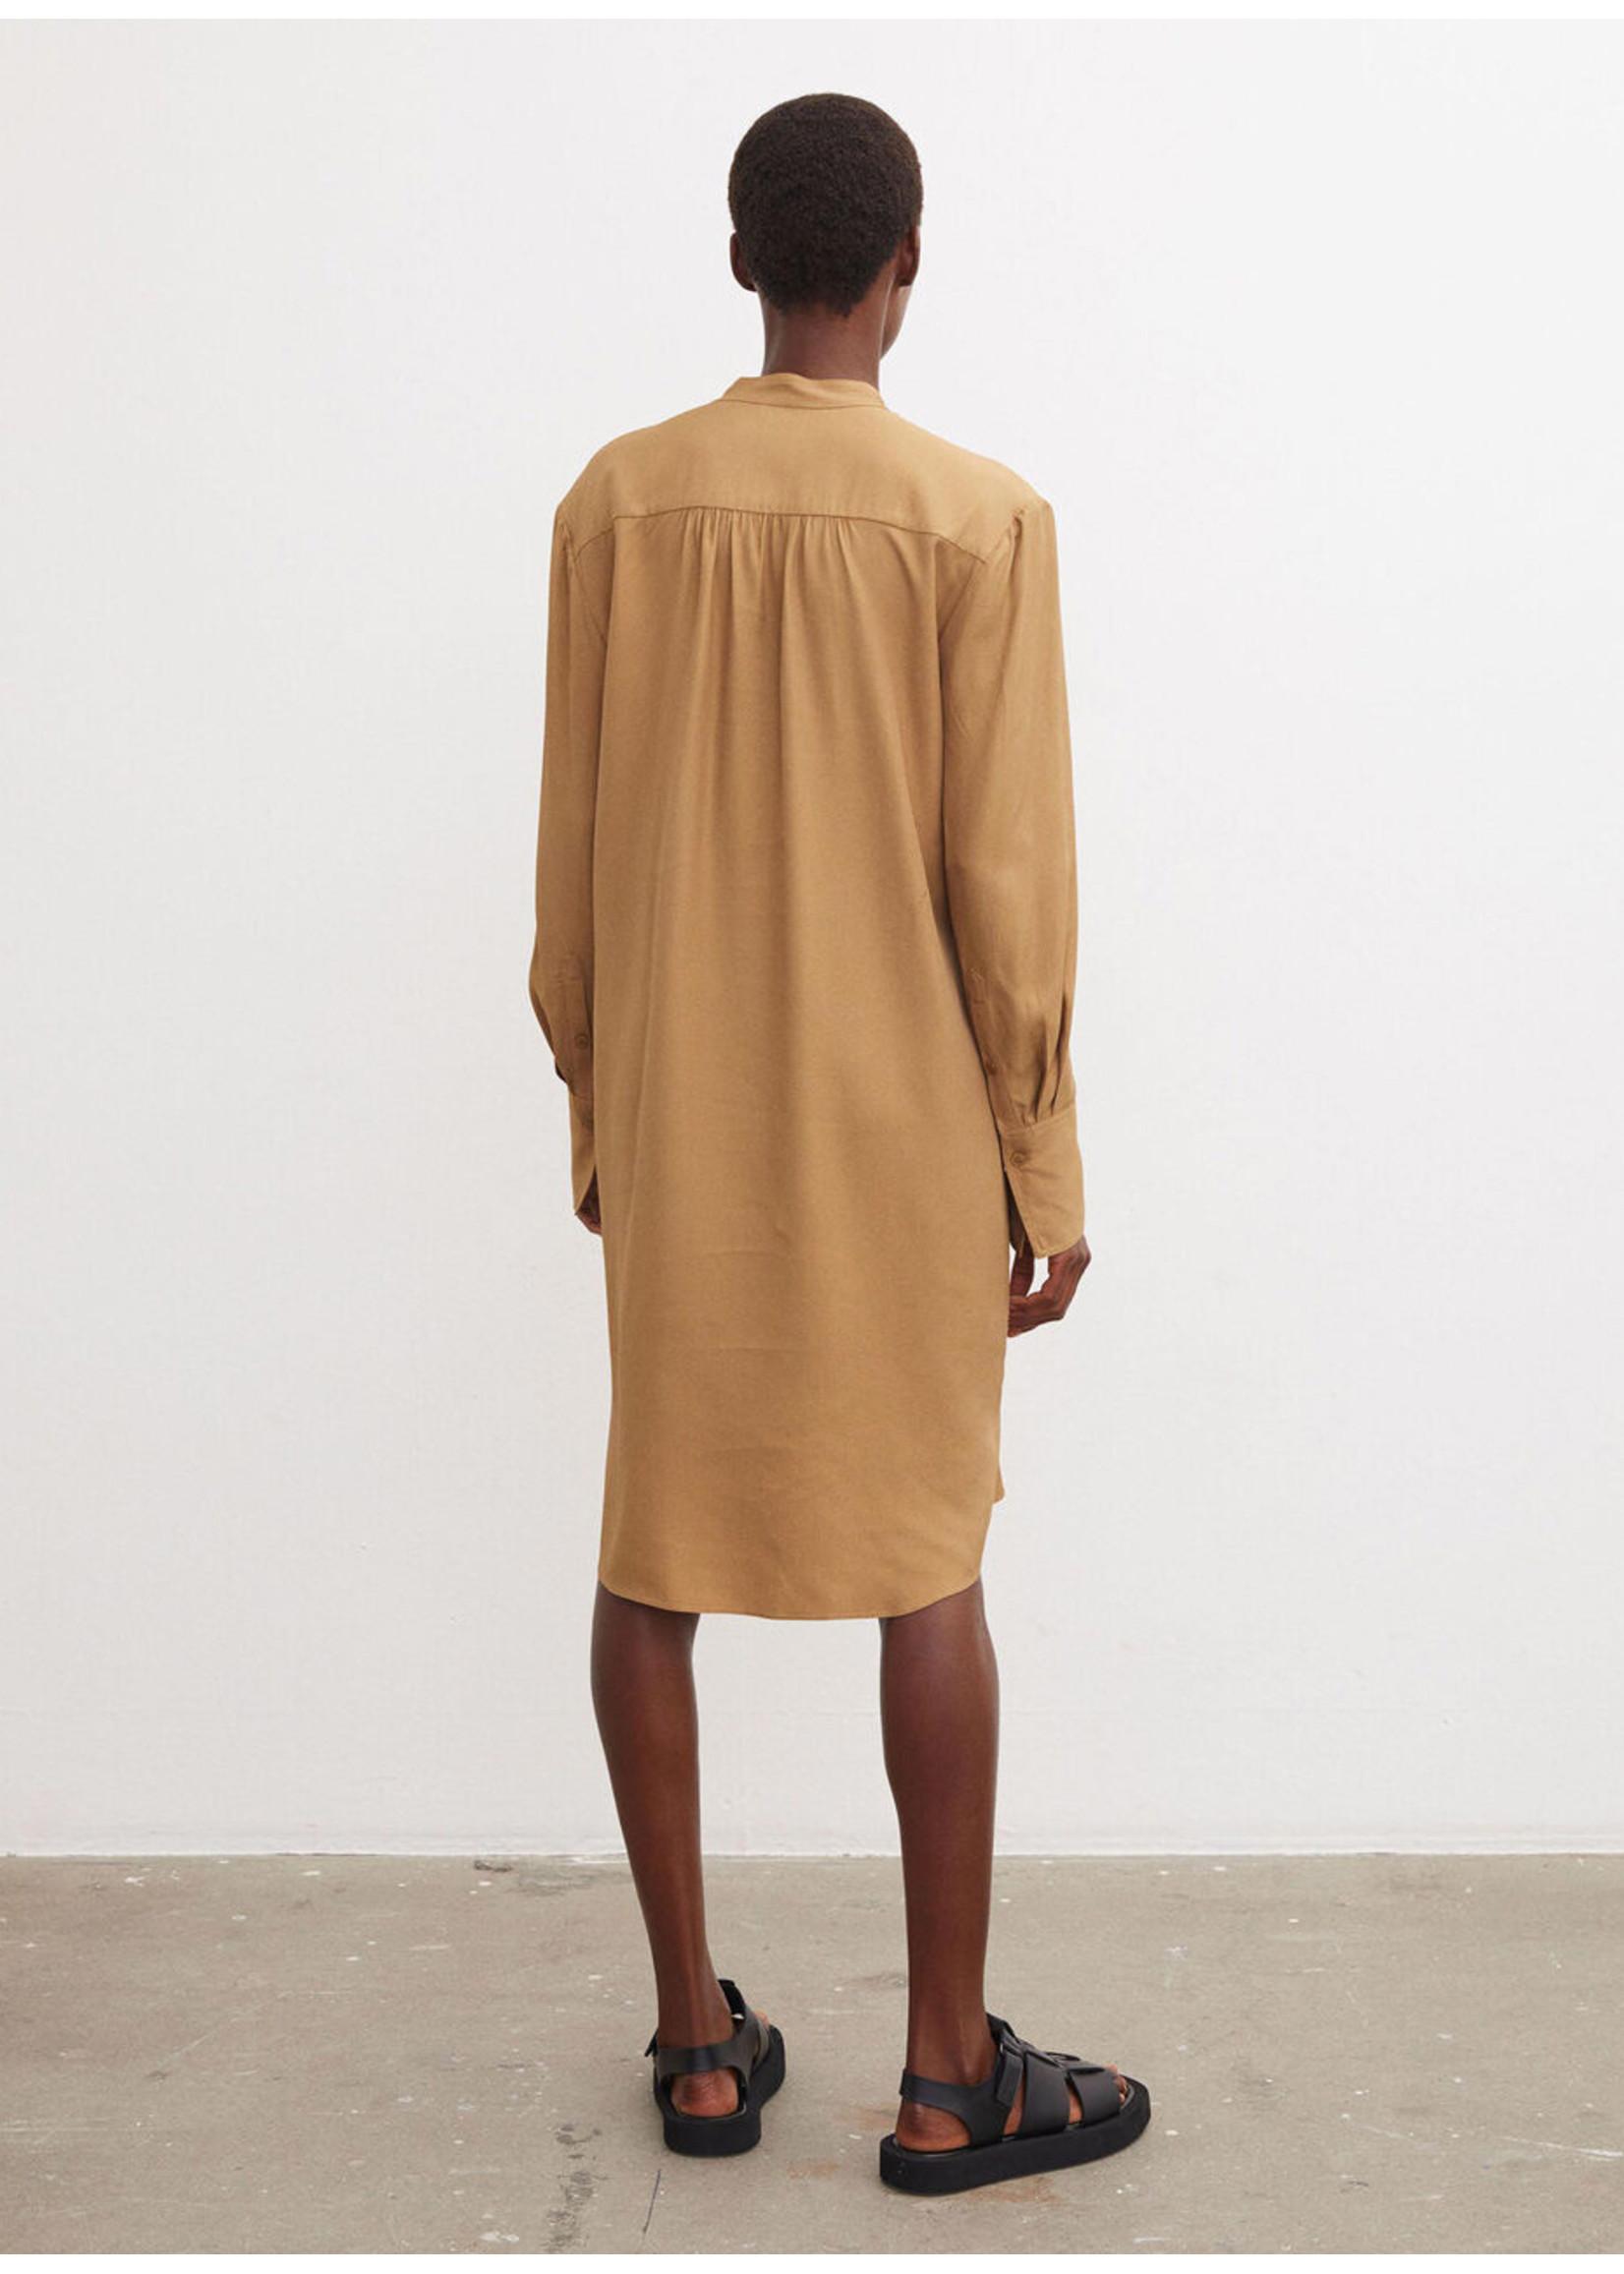 Malene Birger Mabilla dress golden beige